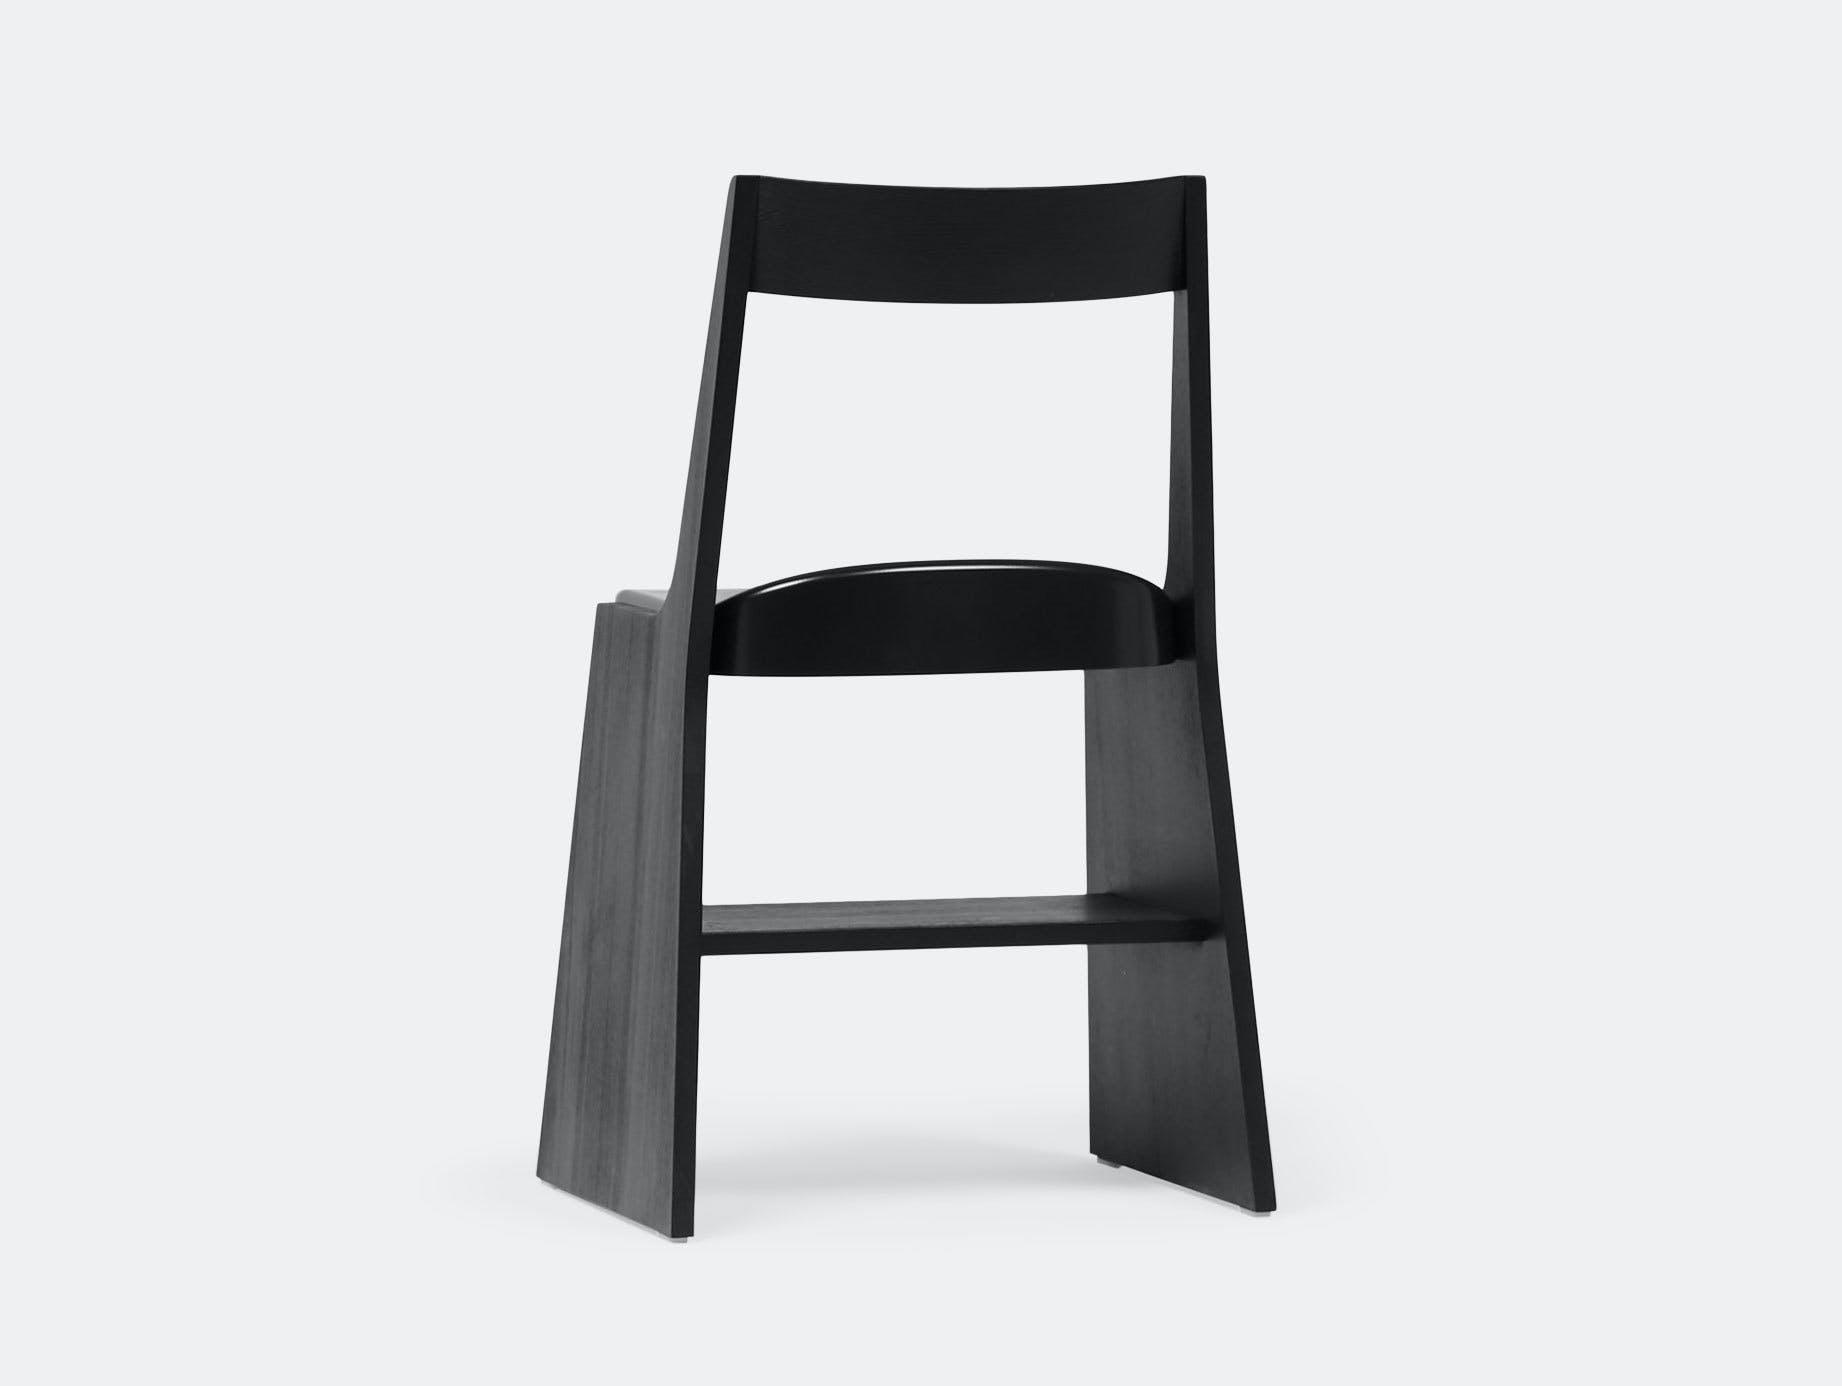 Mattiazzi Fronda Chair Black Sam Hecht Kim Colin